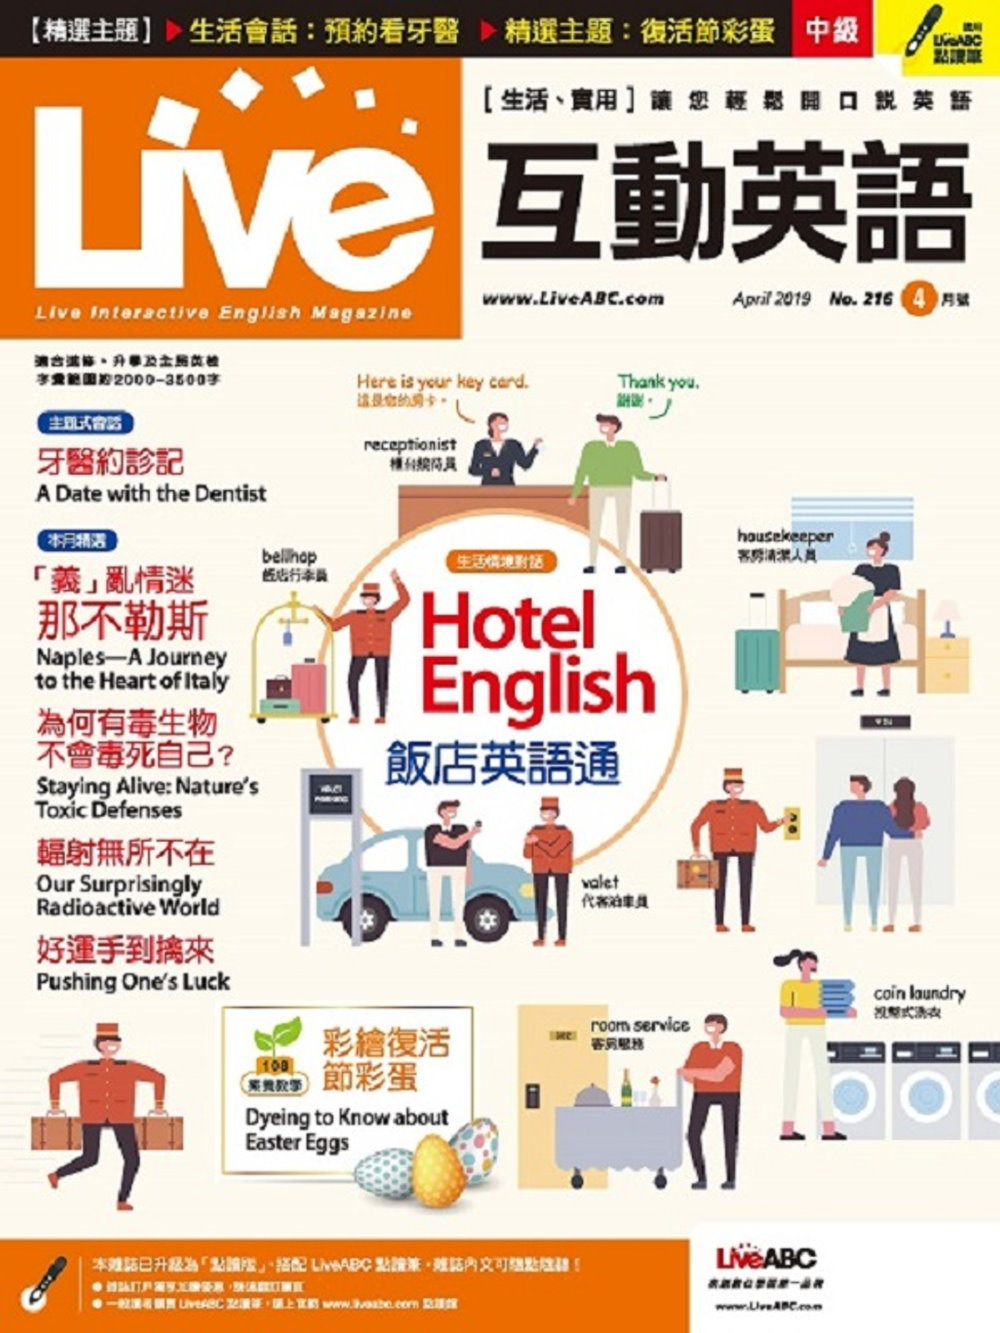 Live互動英語(互動光碟版) 4月號/2019 第216期